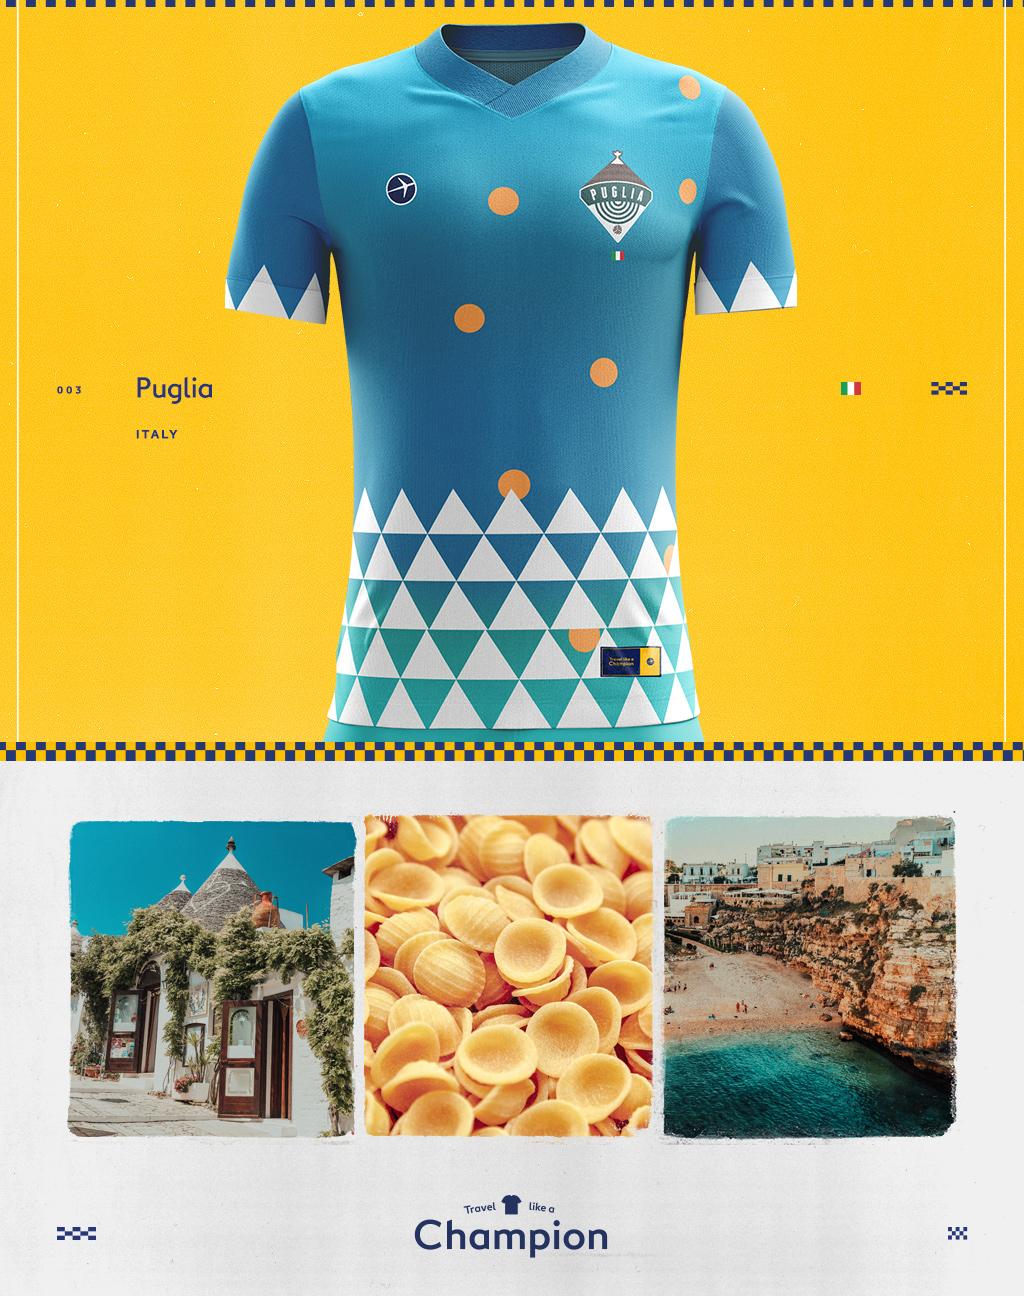 003-puglia-blog-article-1024x1296-uk.jpg?1555974342